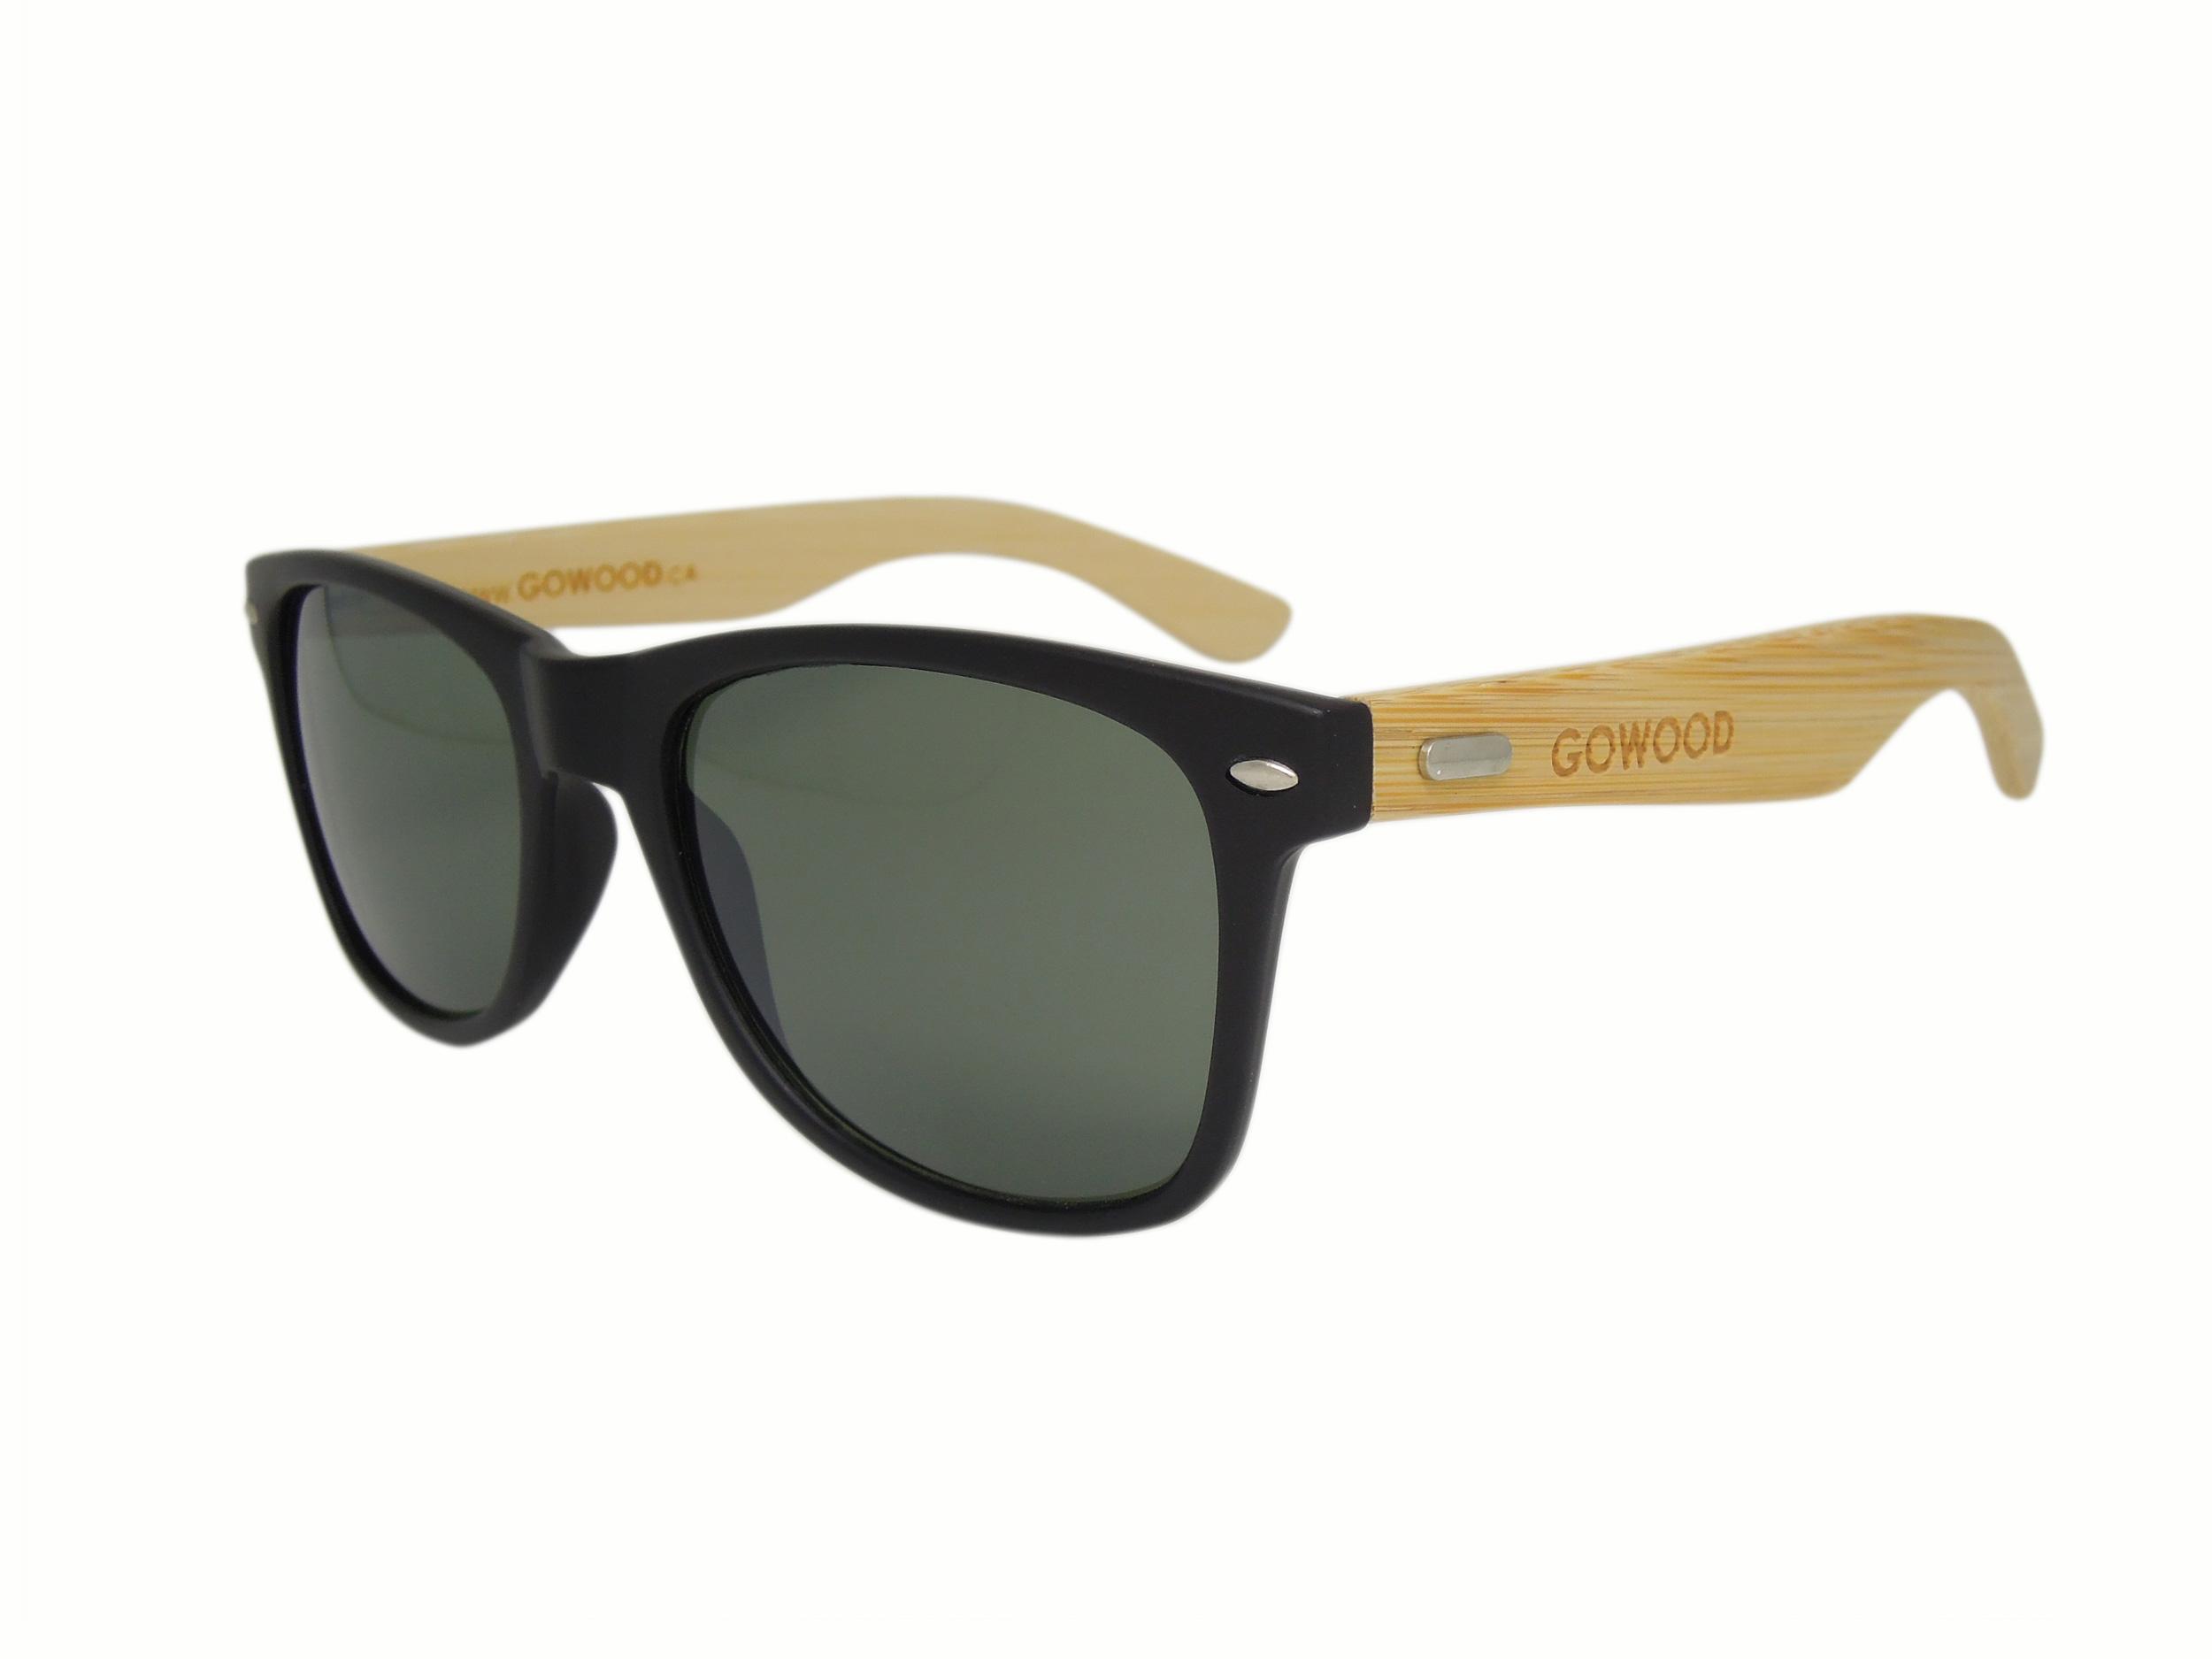 Los Angelesu2019 matt black sunglasses with natural bamboo wooden ...